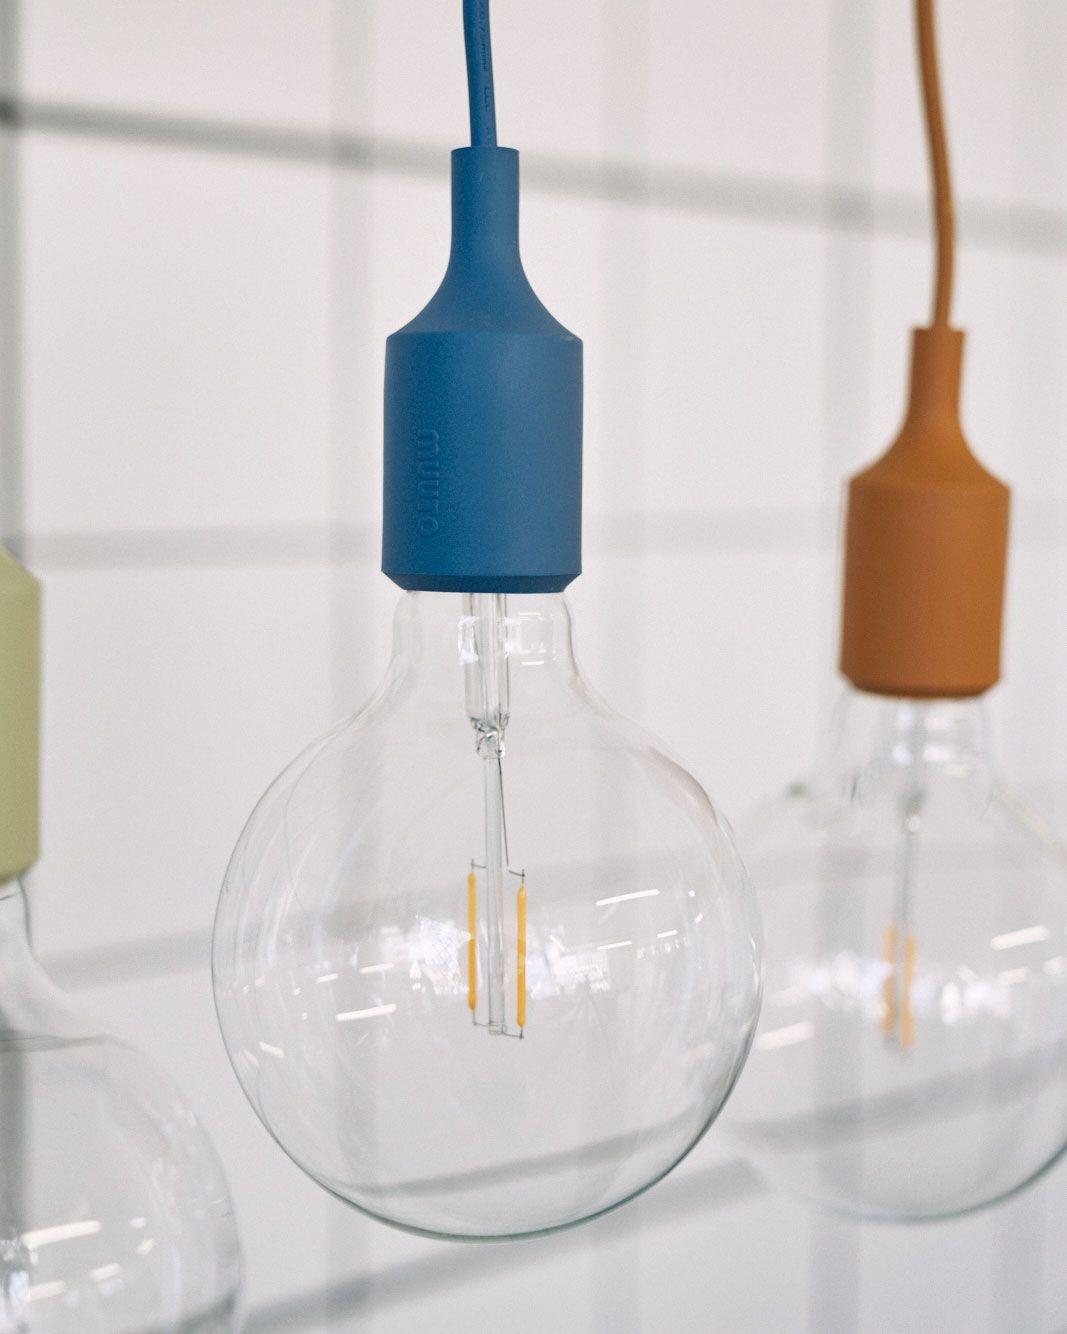 Simple Lighting Inspiration From Muuto Industrial Design Meets Scandinavian Simplicity With The E27 Pendant Pendant Lamp Scandinavian Lighting Simple Lighting